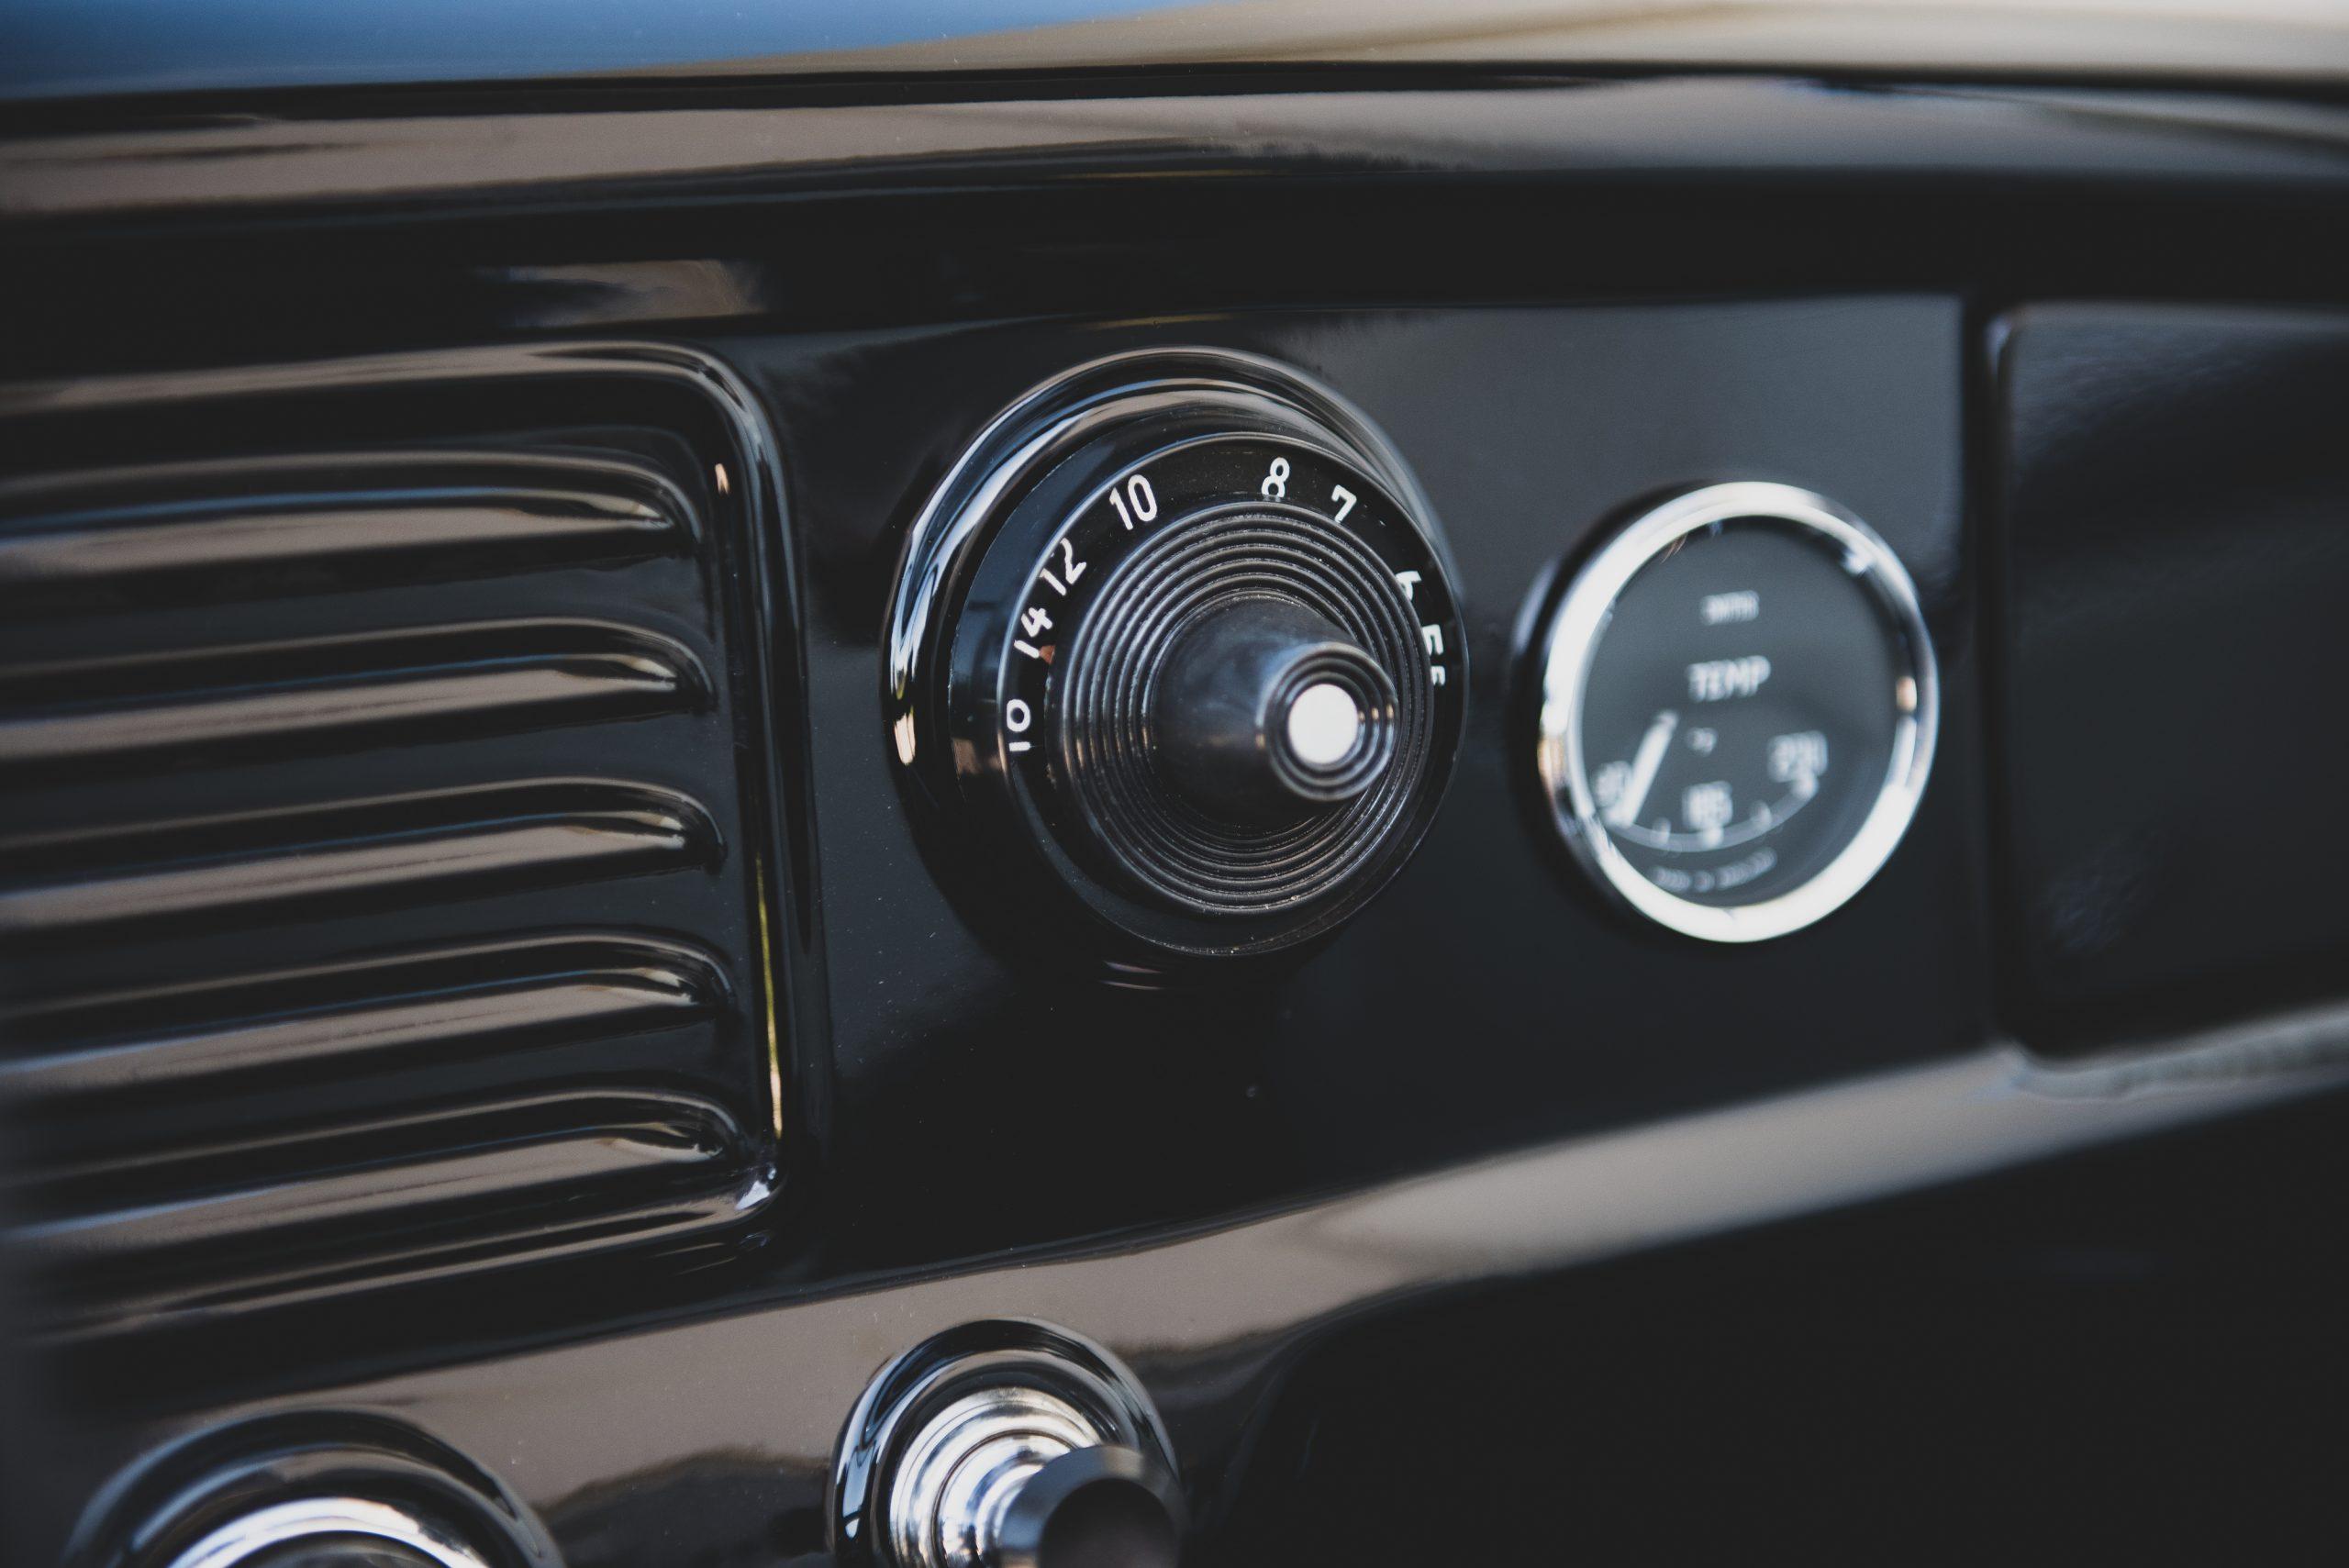 AMC Metropolitan 1500 Convertible gauge detail